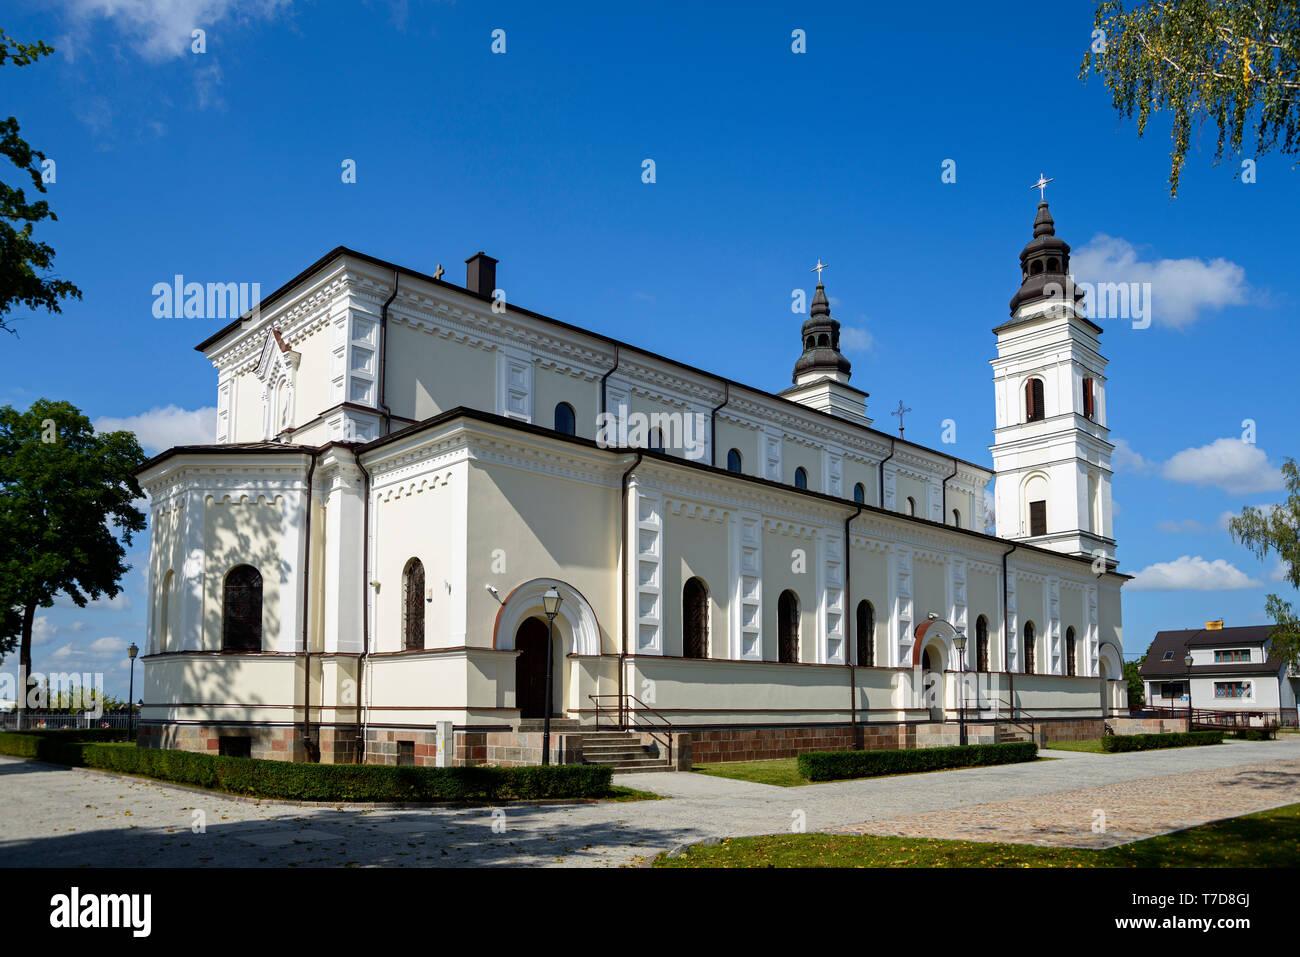 Church, Suwalki, Podlasie, Poland - Stock Image